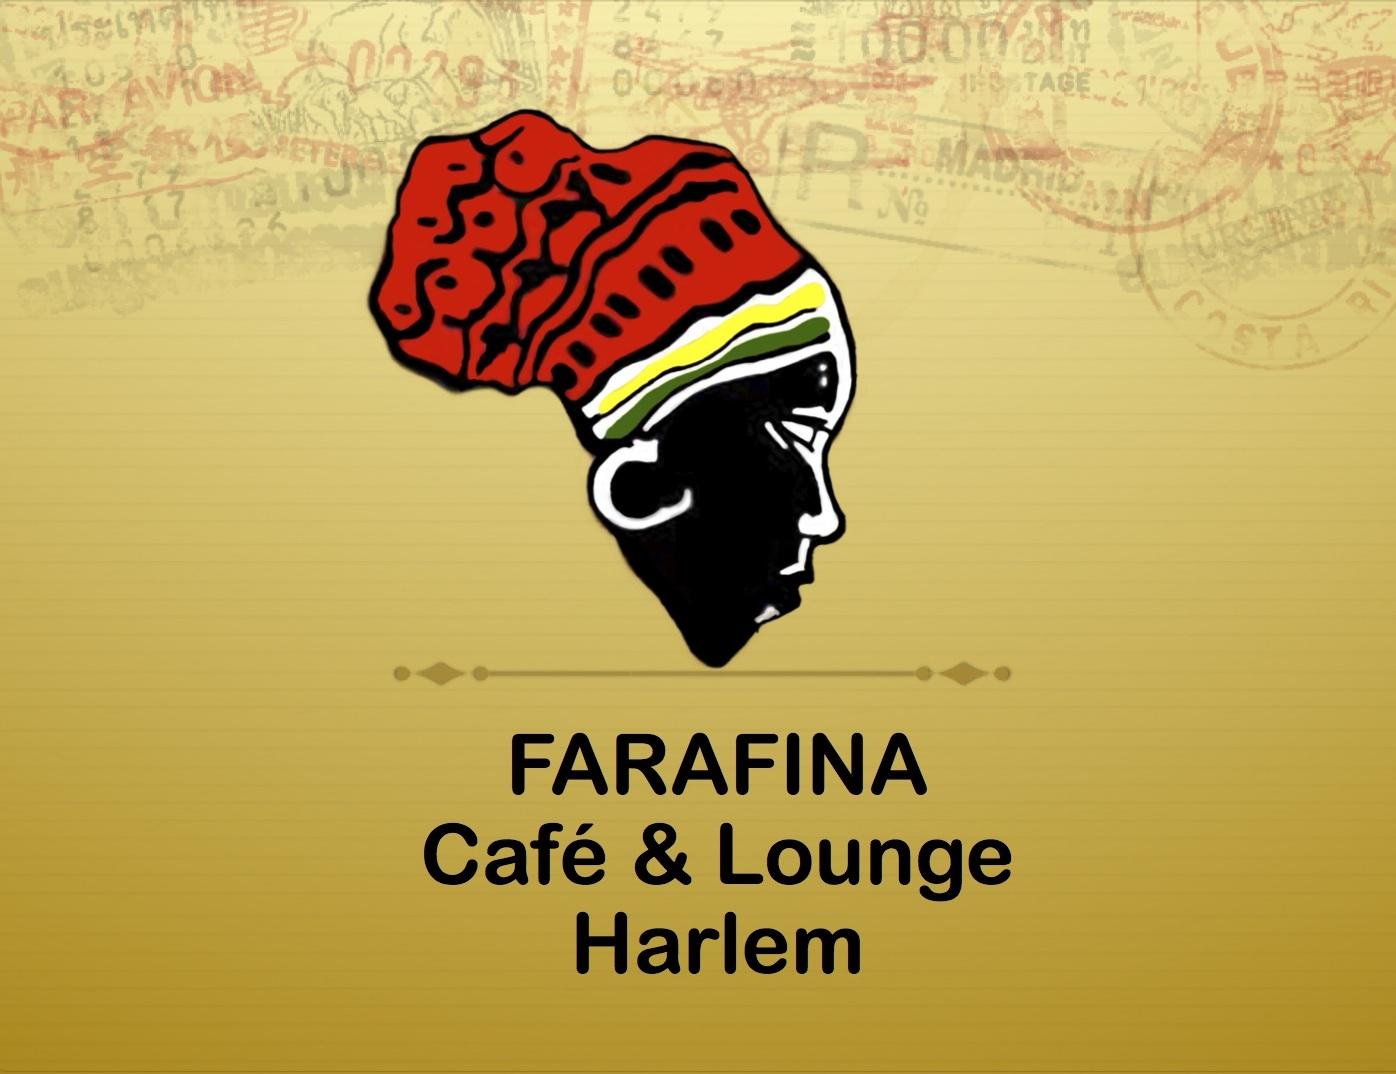 Farafina  Cafe Lounge Harlem